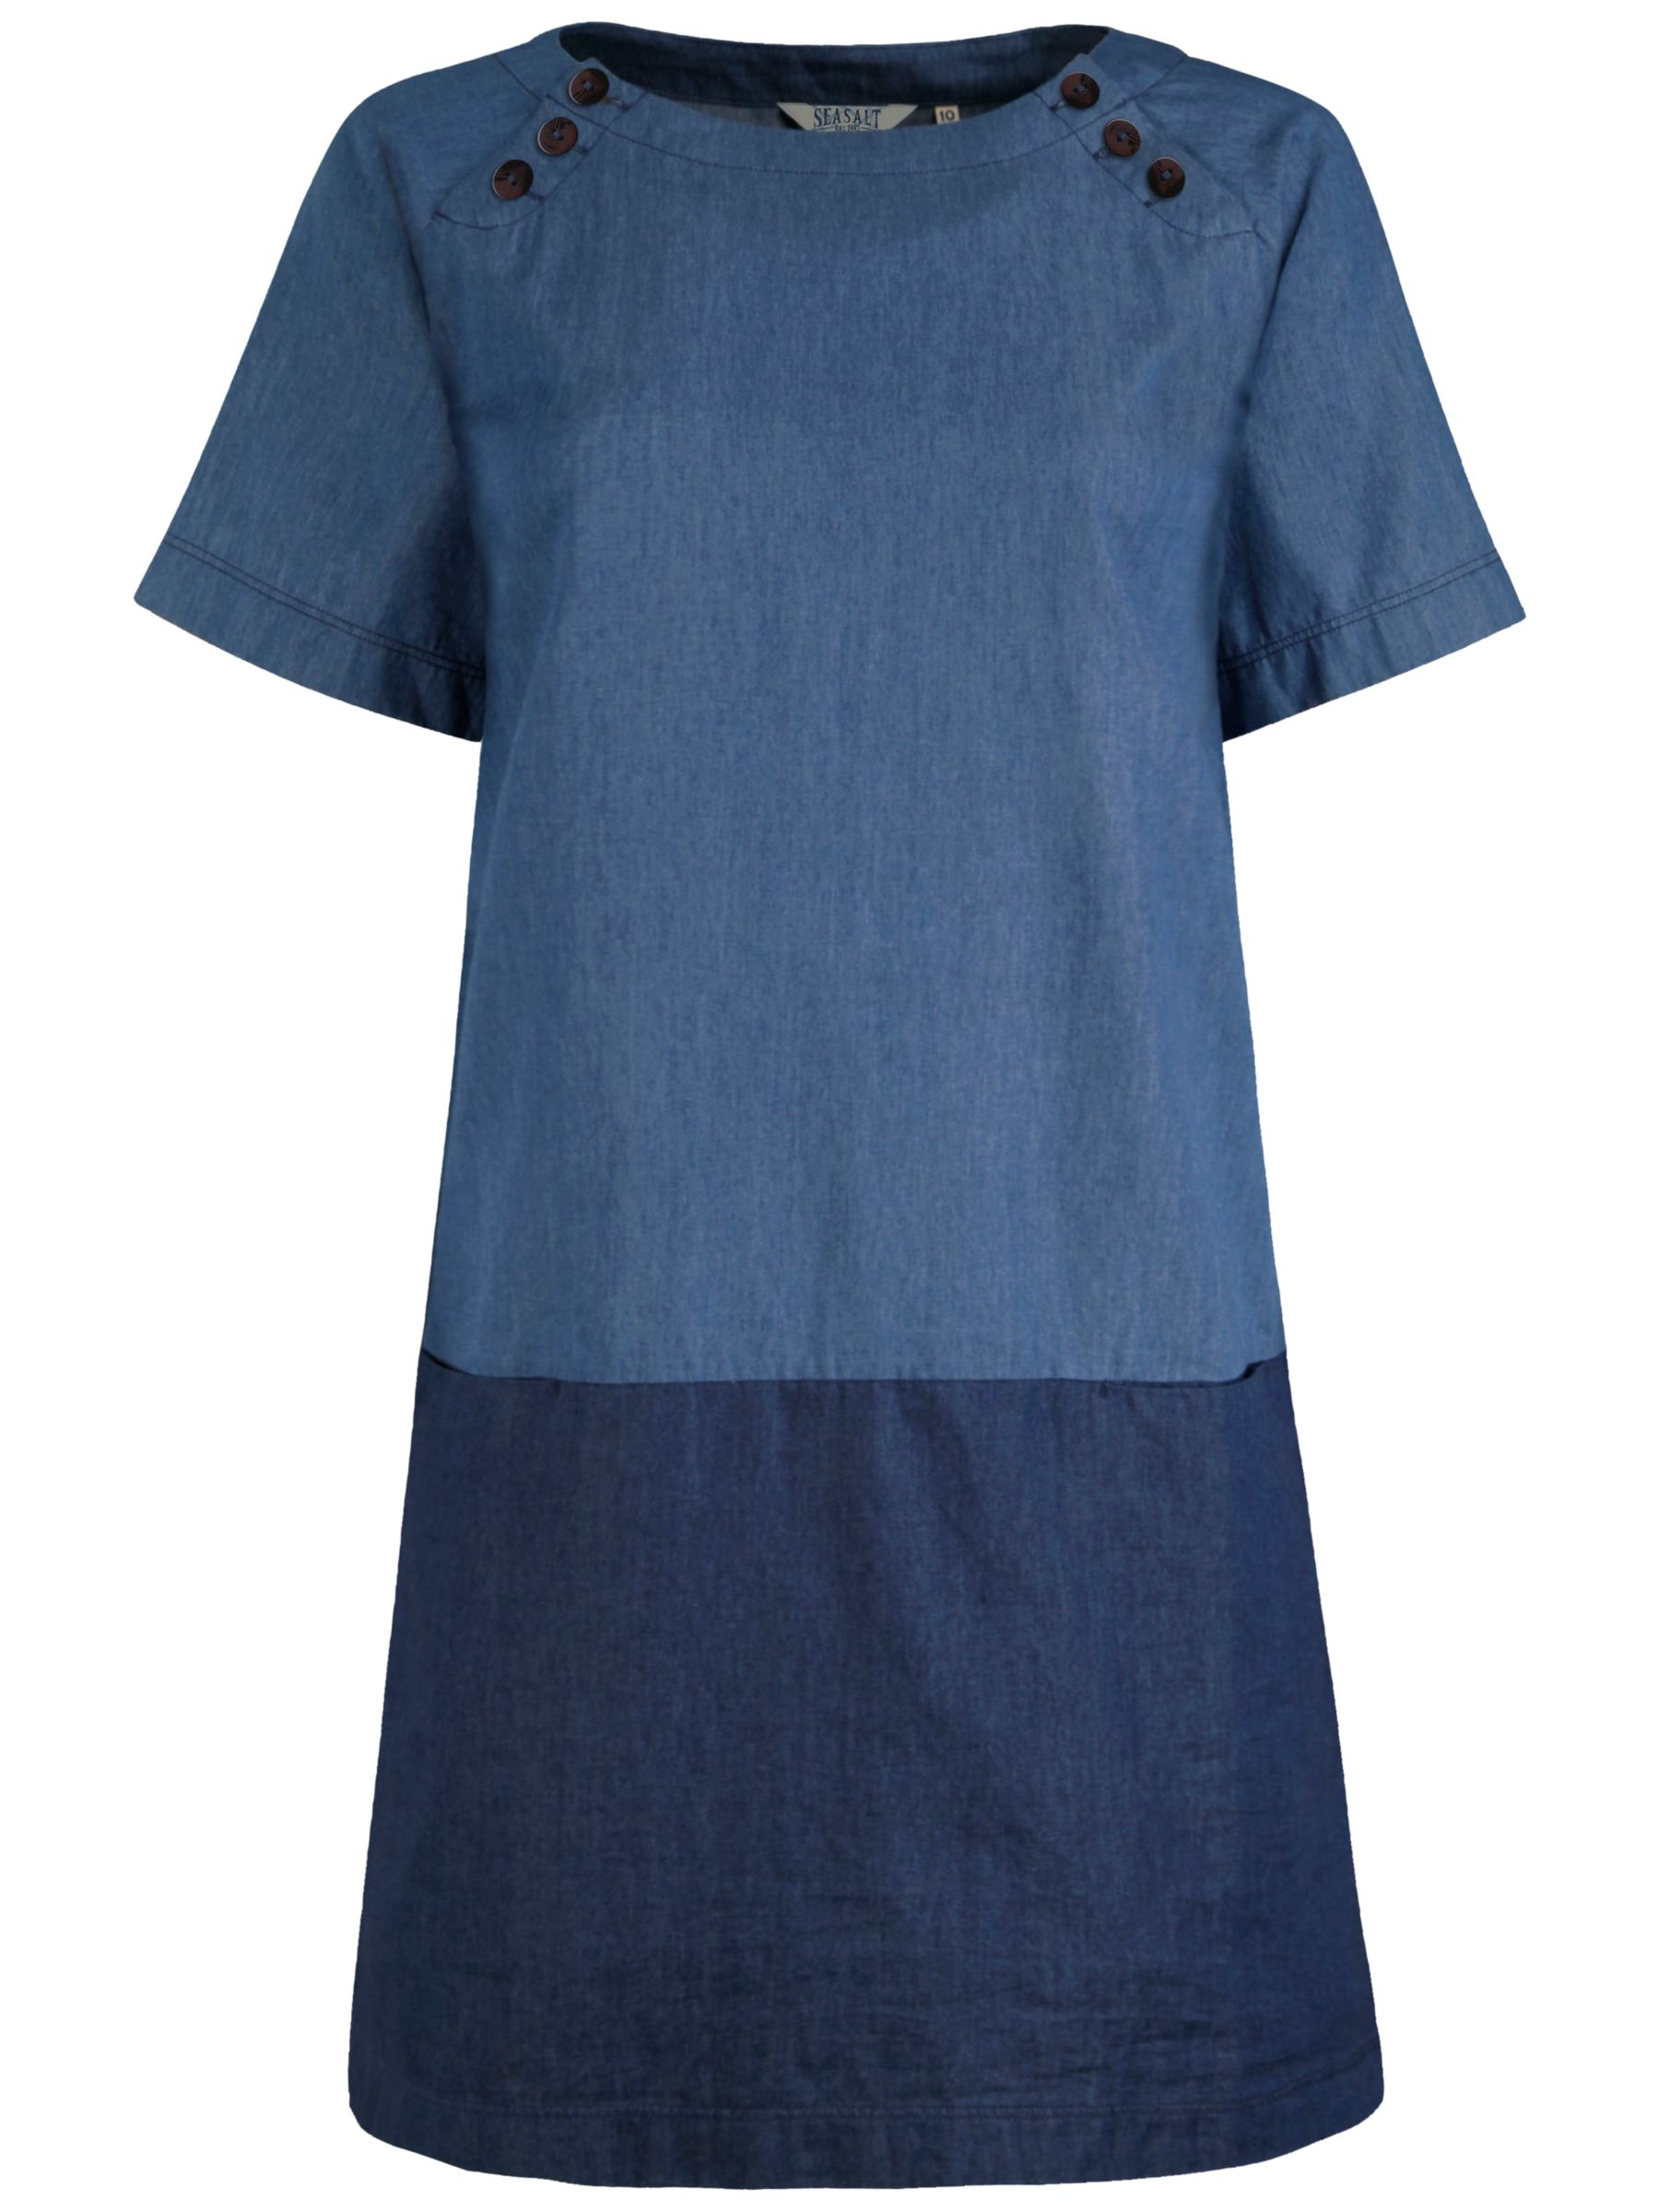 seasalt hops cotton dress indigo, seasalt, hops, cotton, dress, indigo, 16|14|12|10|8, women, womens dresses, 1927301